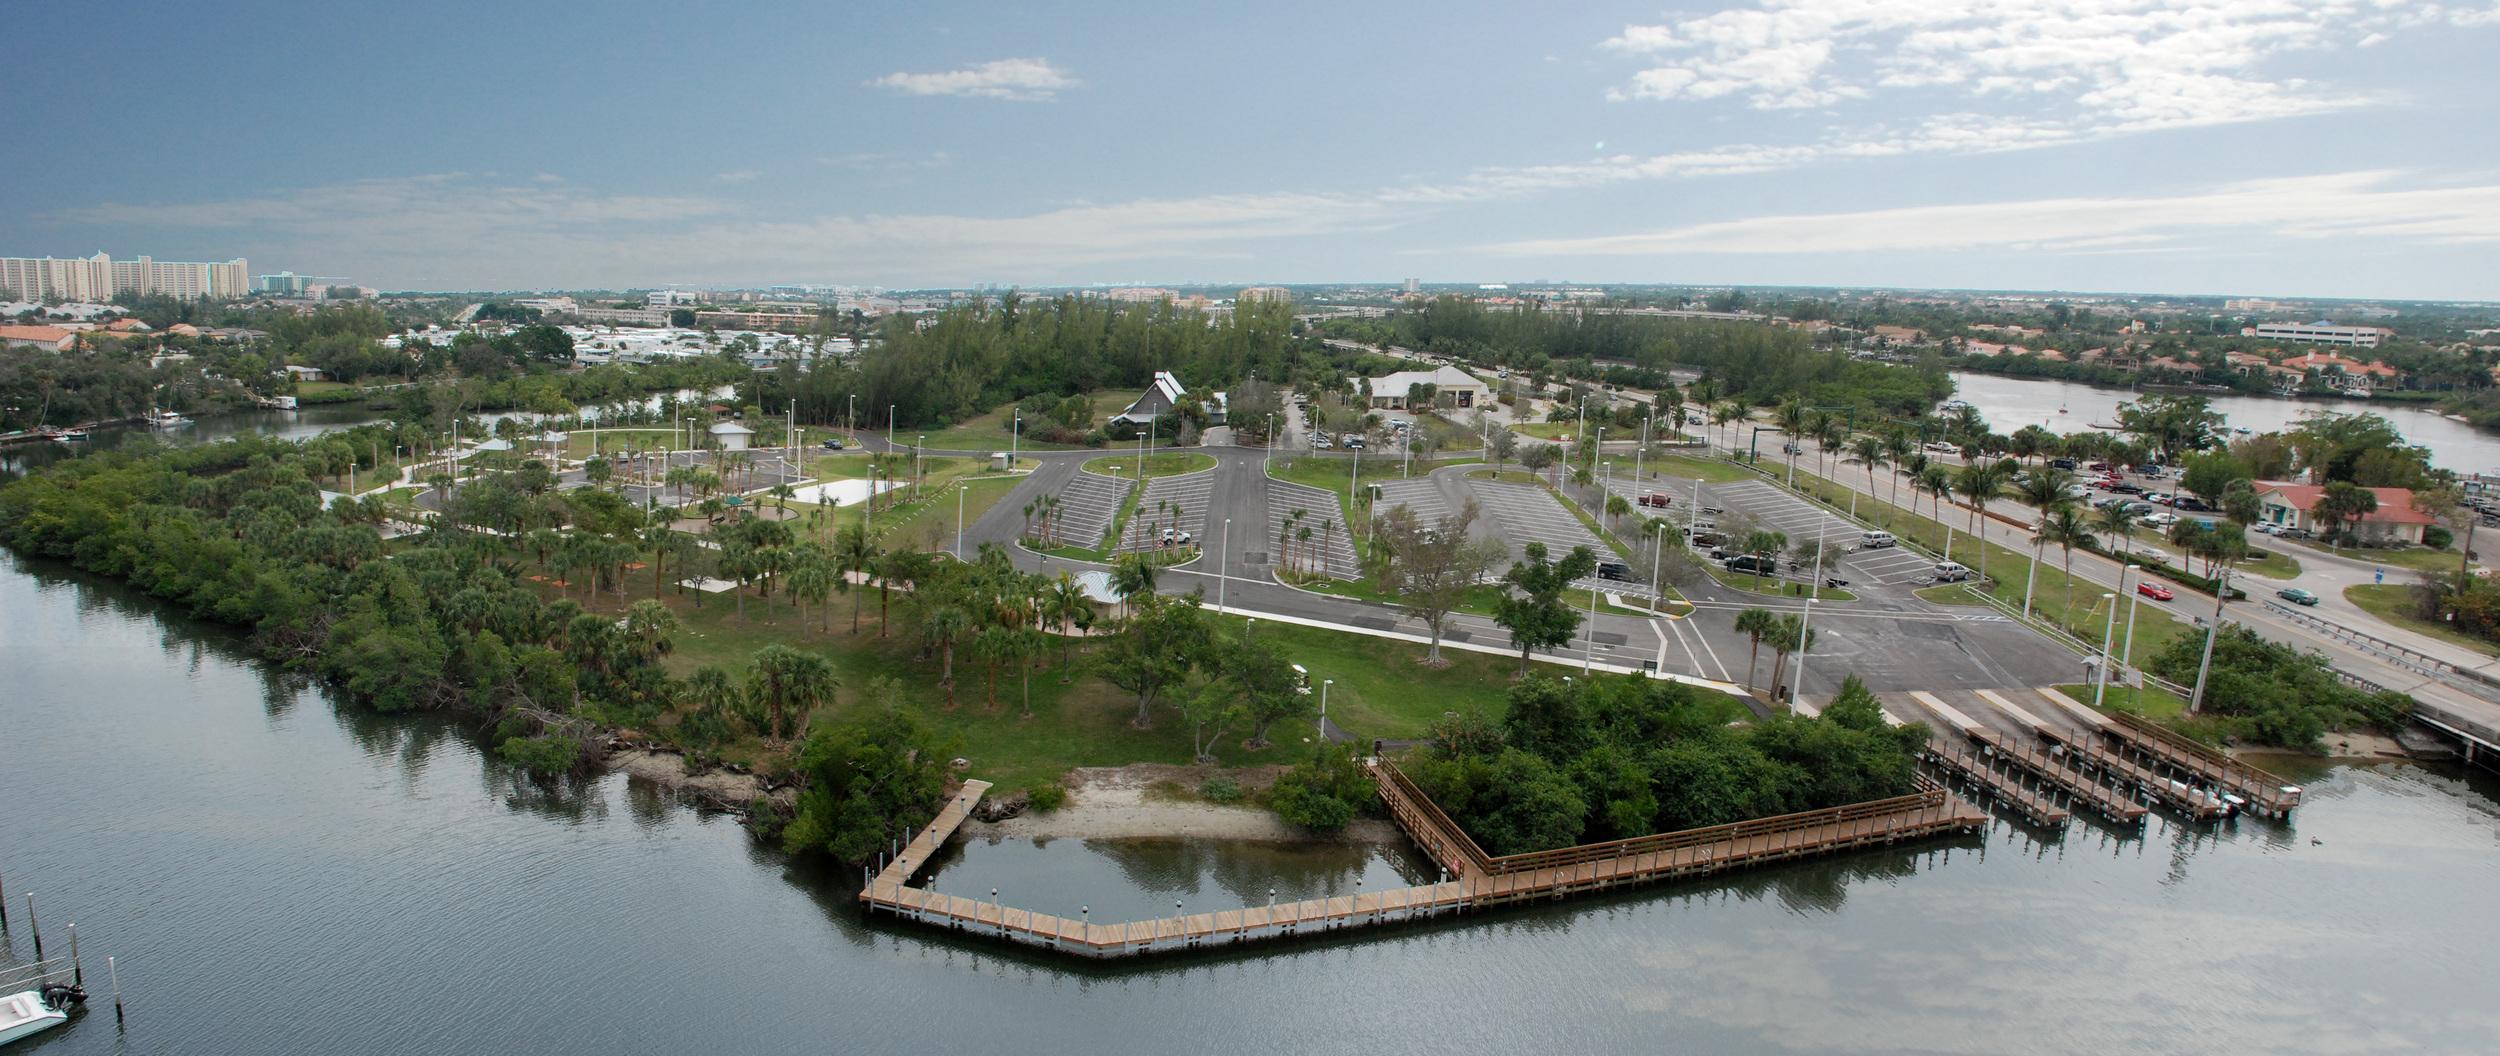 Burt Reynolds Park Palm Beach County Florida birds eye aerial.jpg